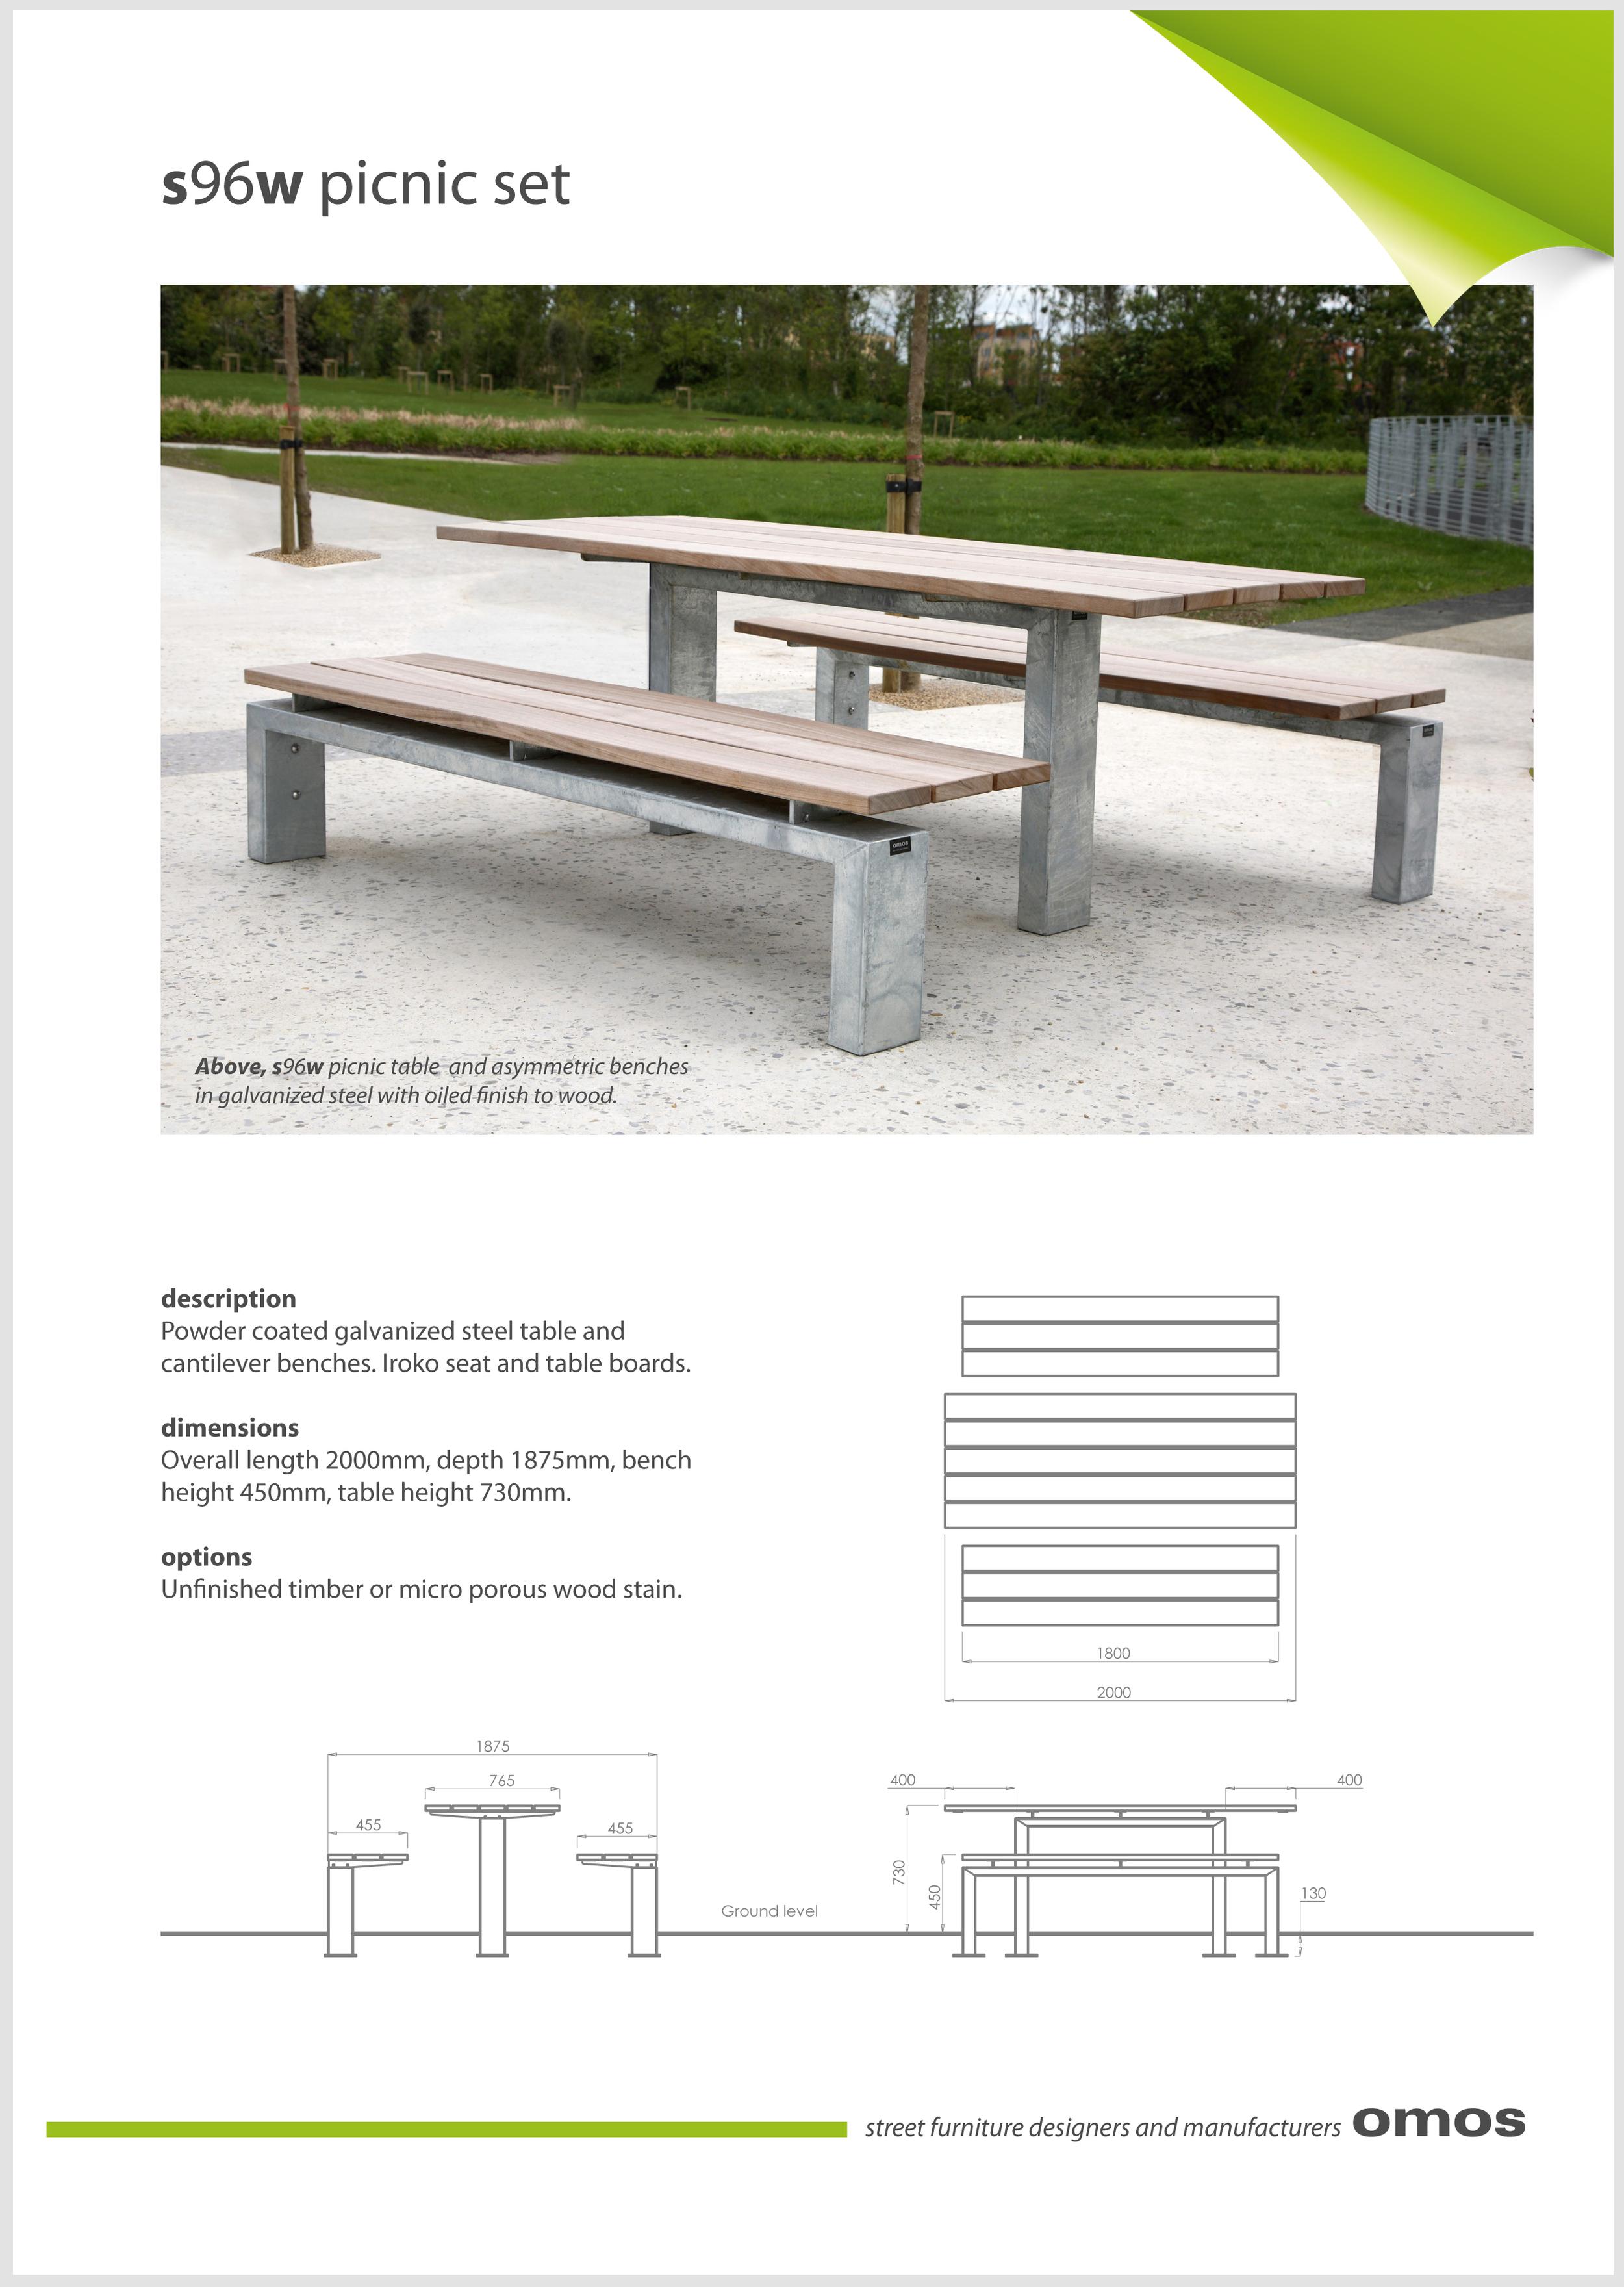 s96w picnic set data sheet.jpg